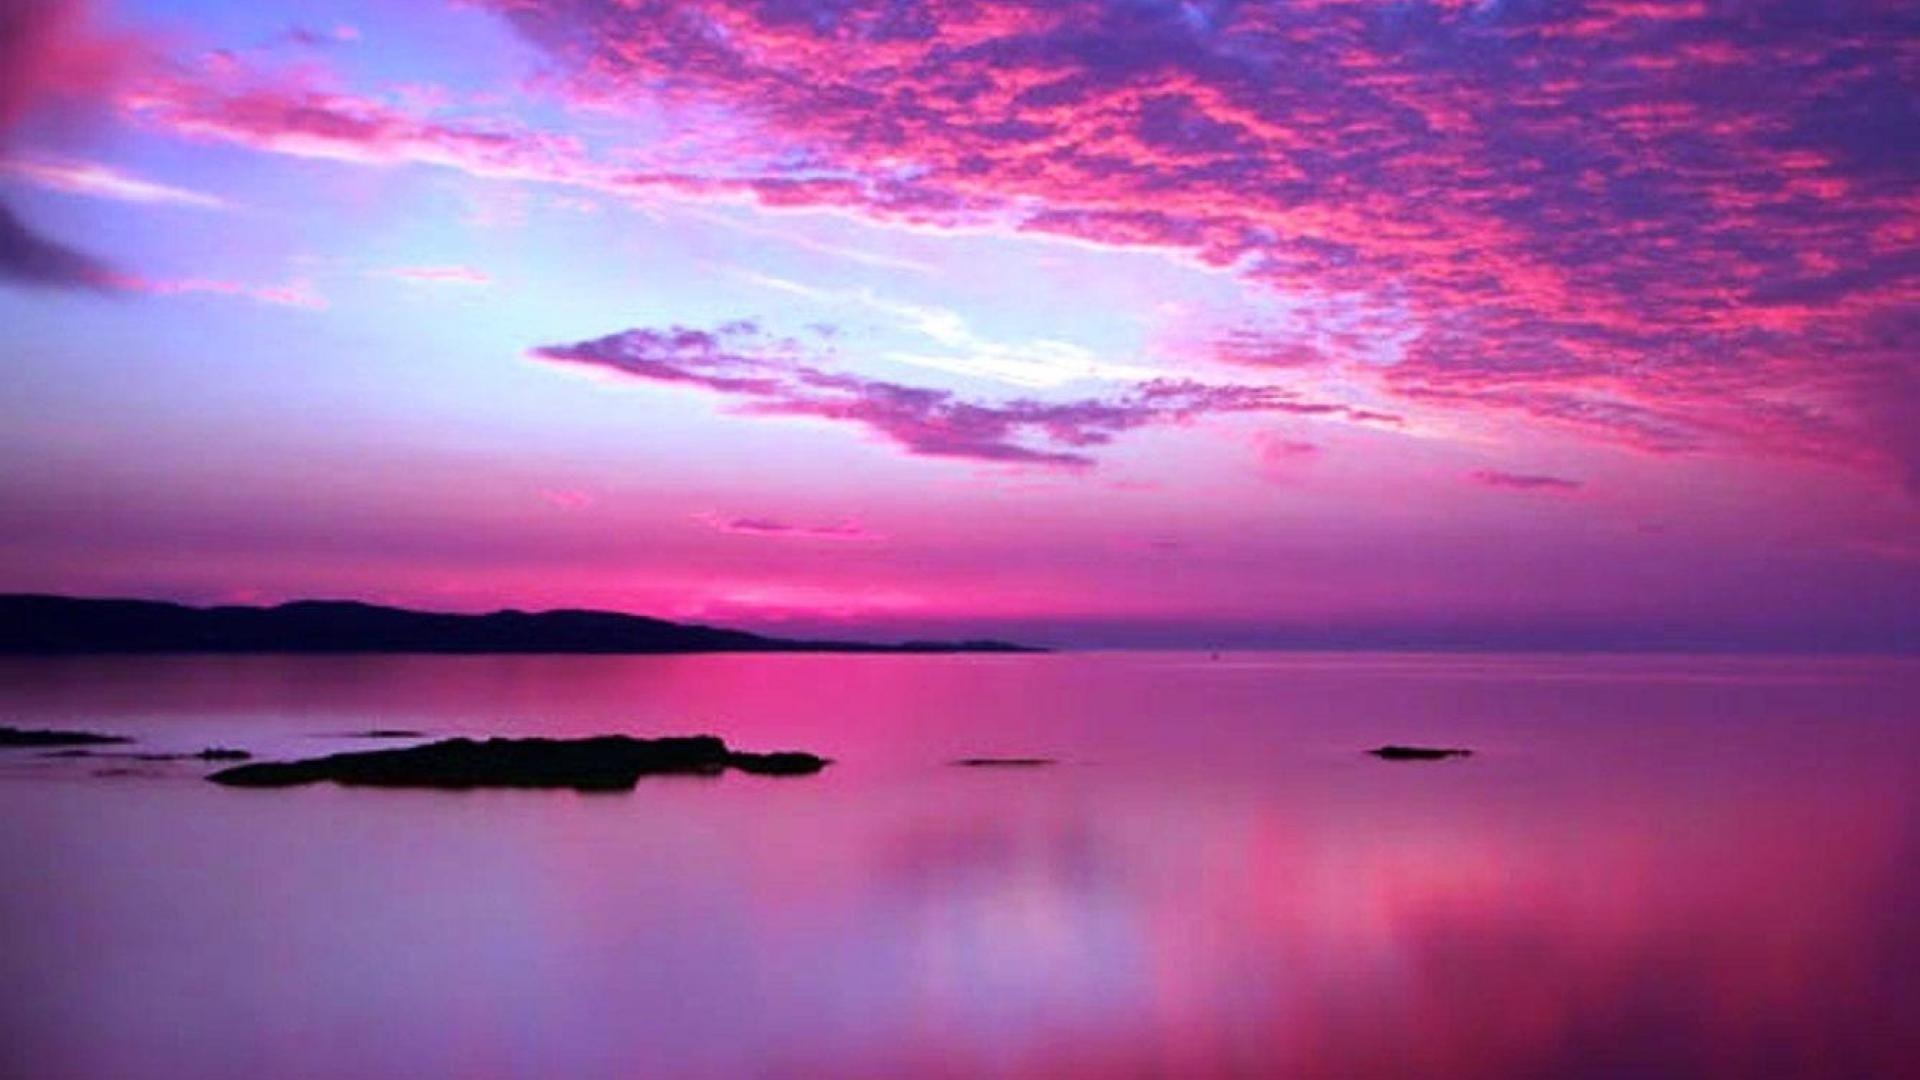 Res 1920x1080 Pink Sunsets Pink Sunset Wallpaper 82699 Sunset Wallpaper Beautiful Sunset Pictures Beach Sunset Wallpaper